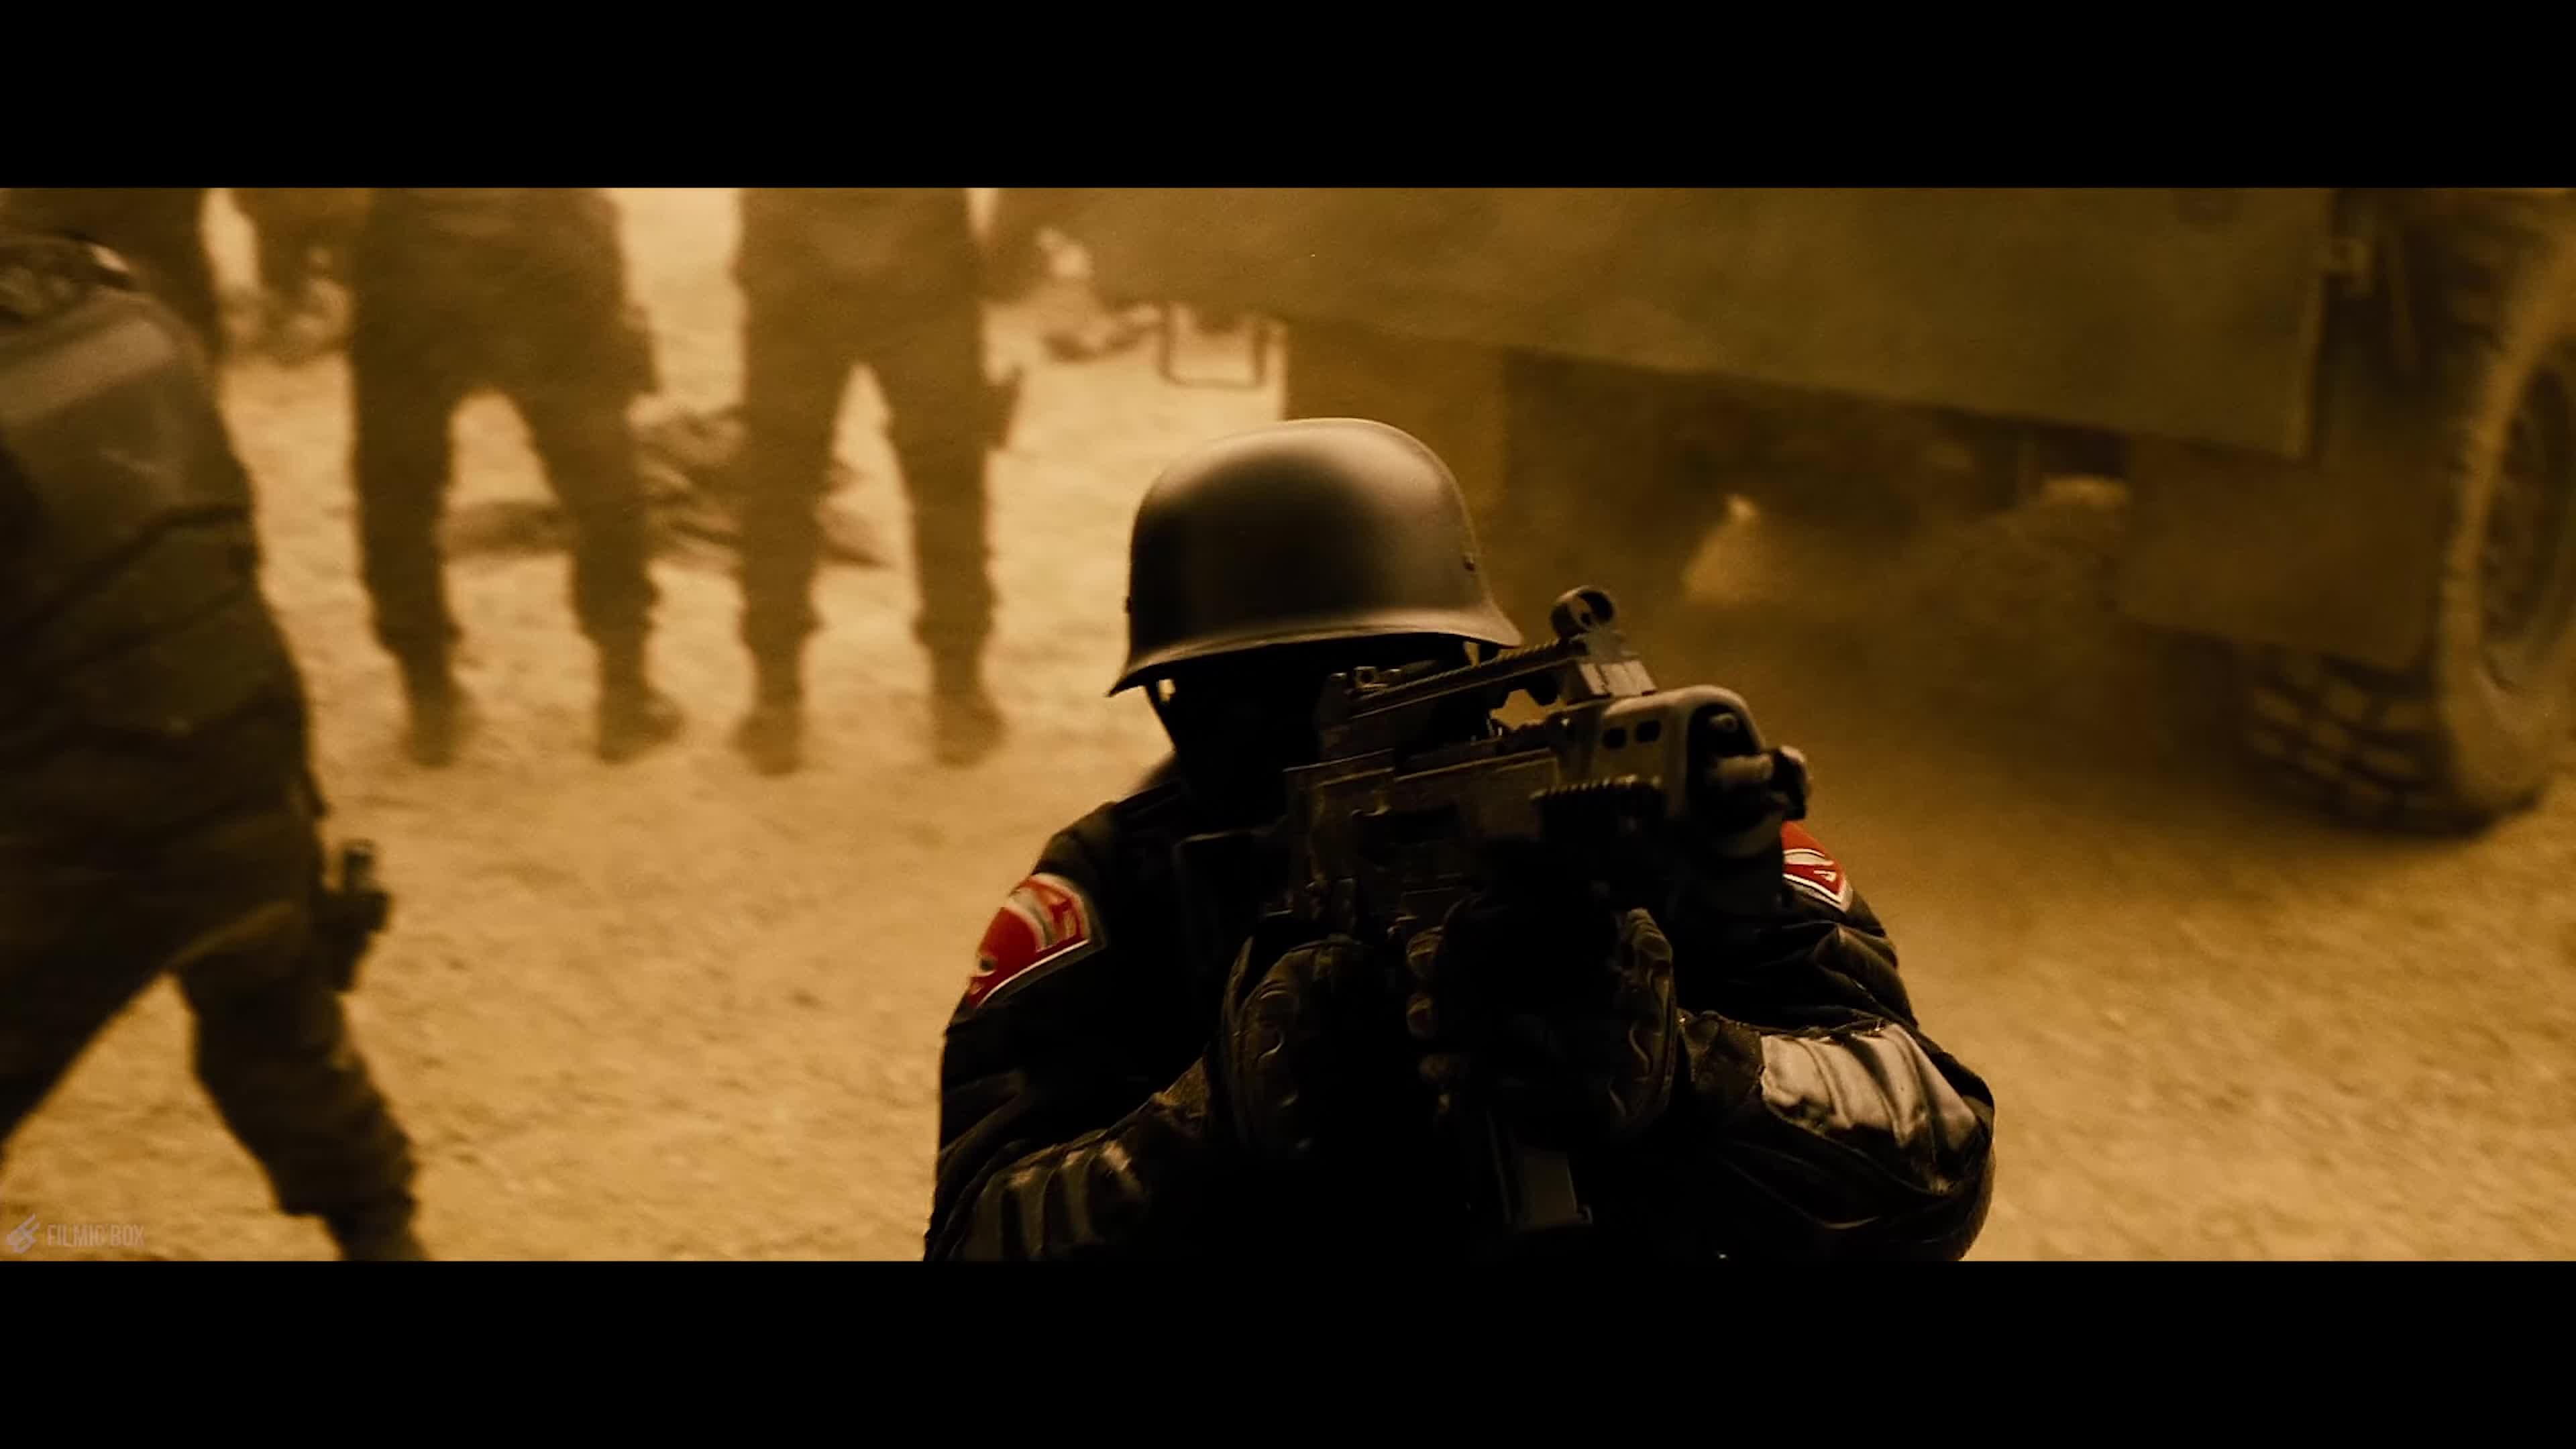 Batman's Nightmare Scene, batman, batman knightmare, batman nightmare, injustice, justice league, movie, nightmare, scene, yt:cc=on, Insurgency Soldier Skill 2 GIFs